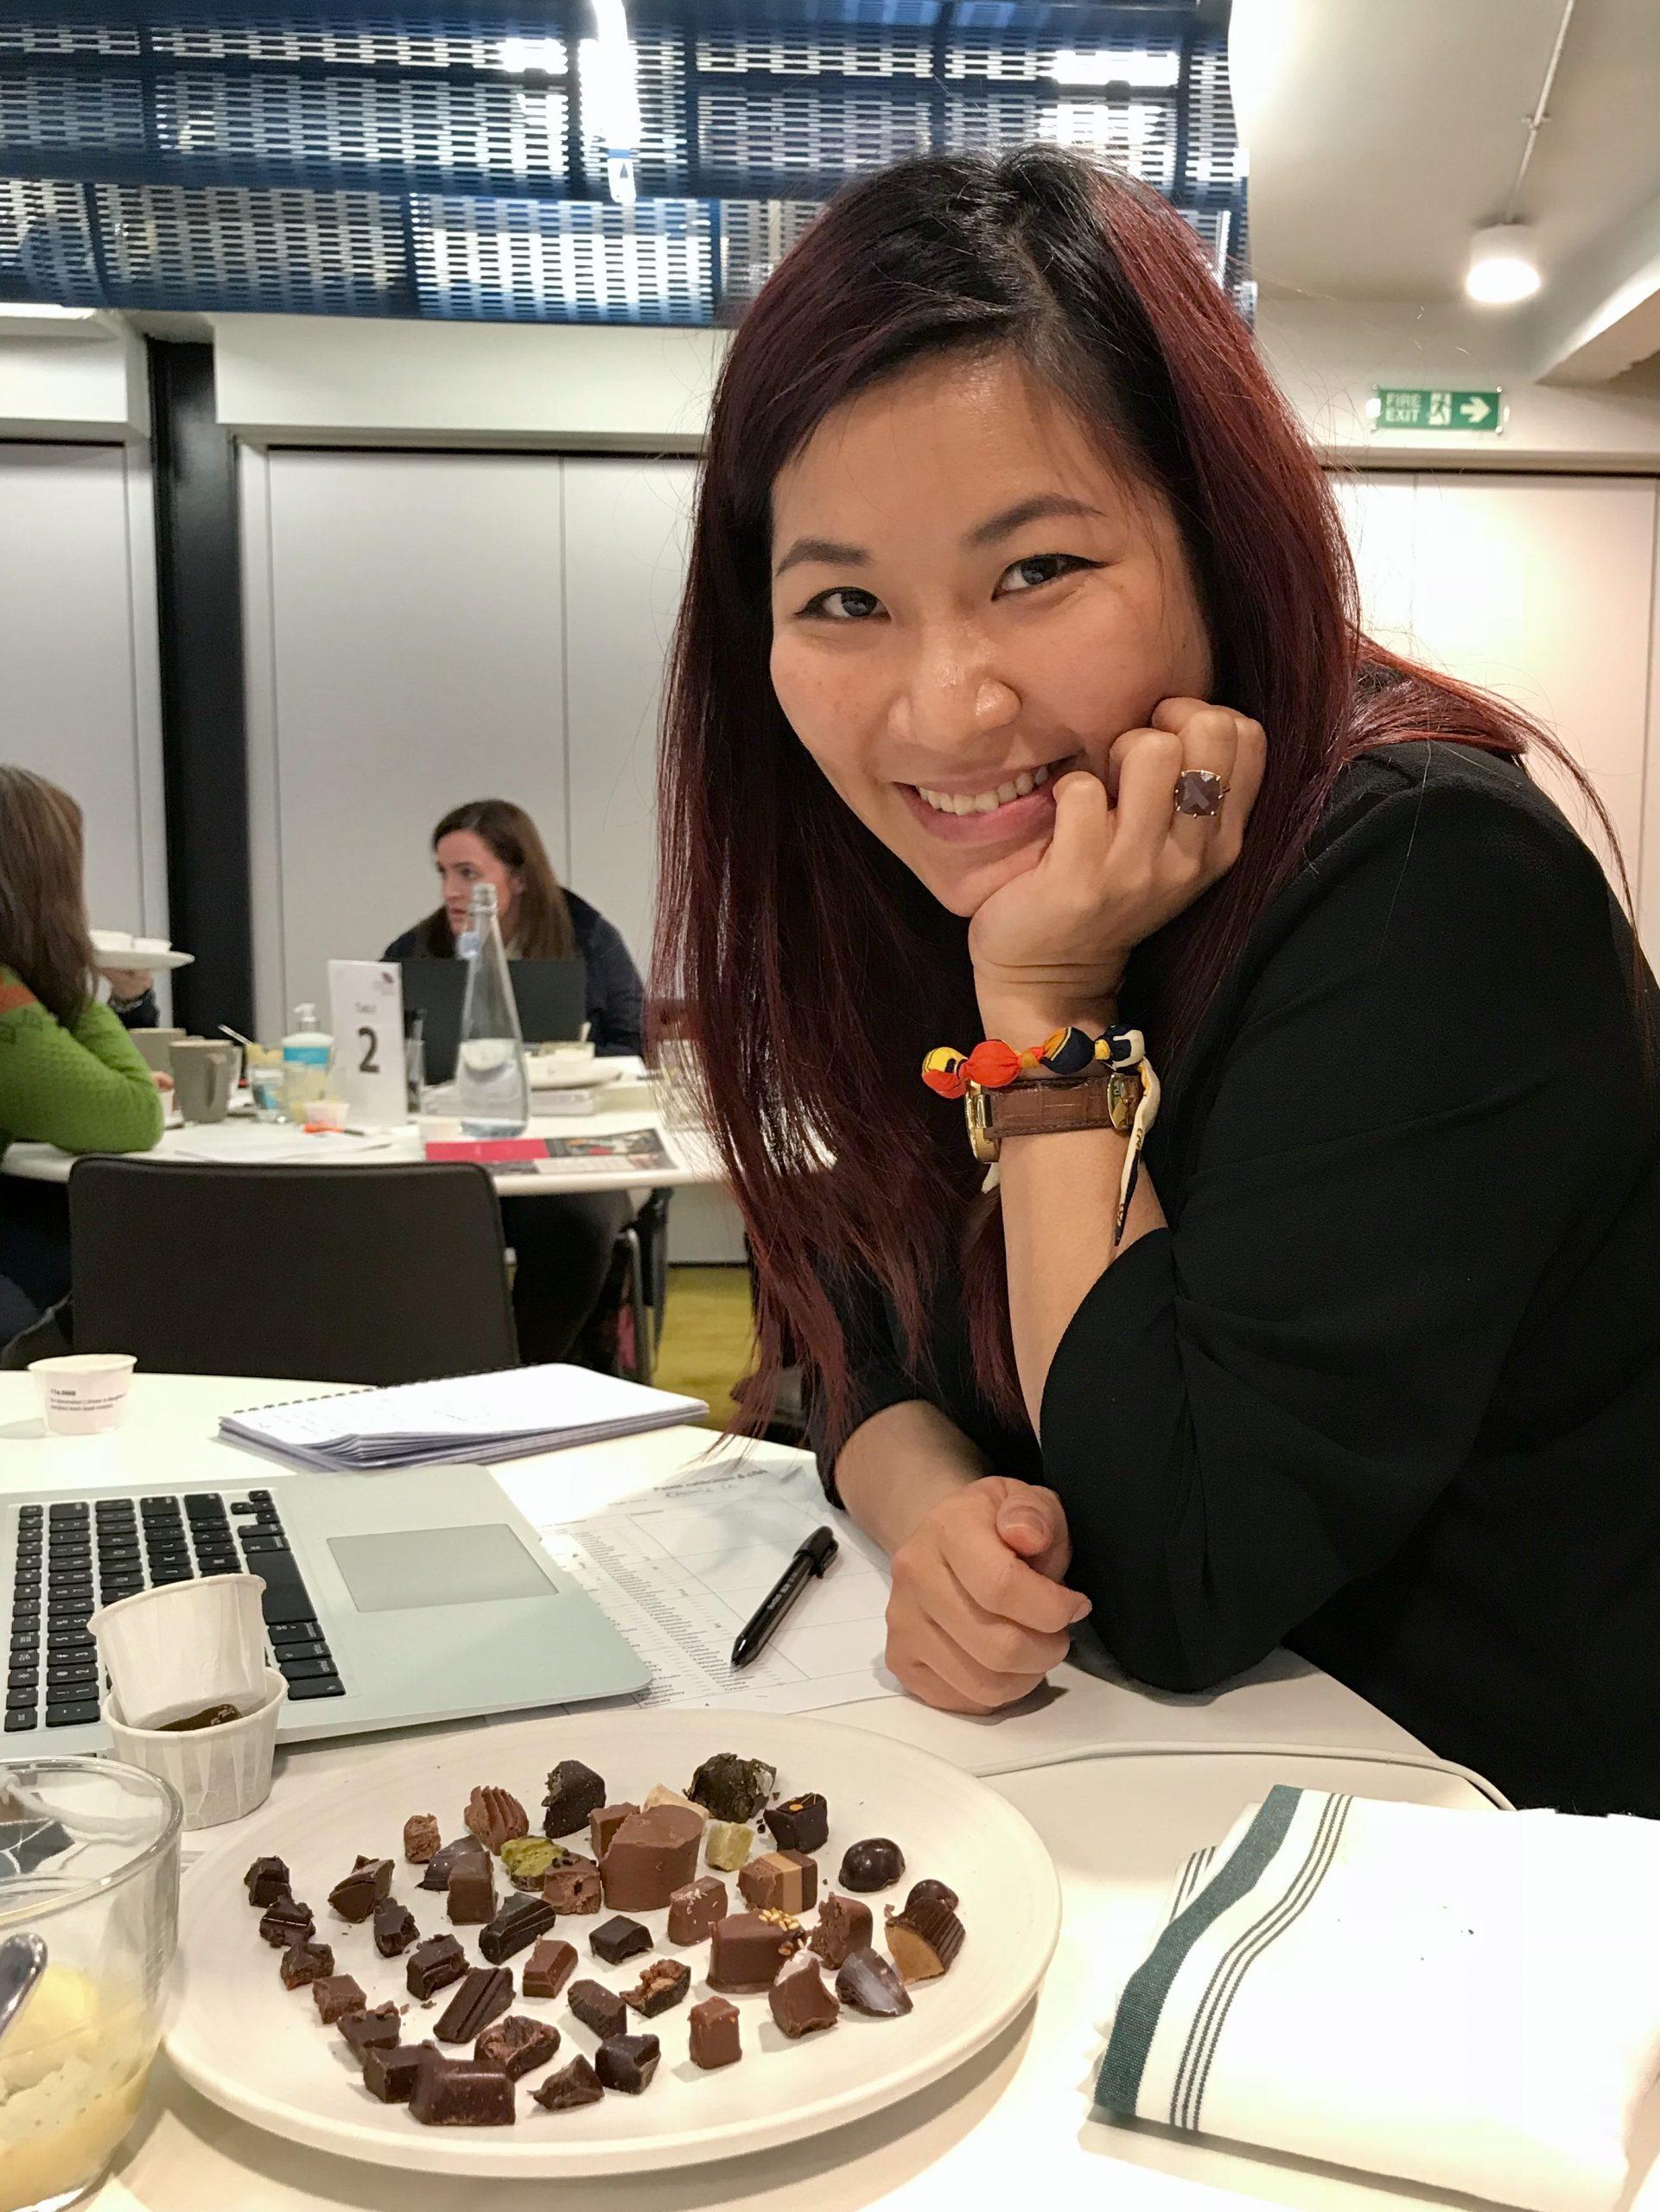 Professional Chocolate Taster